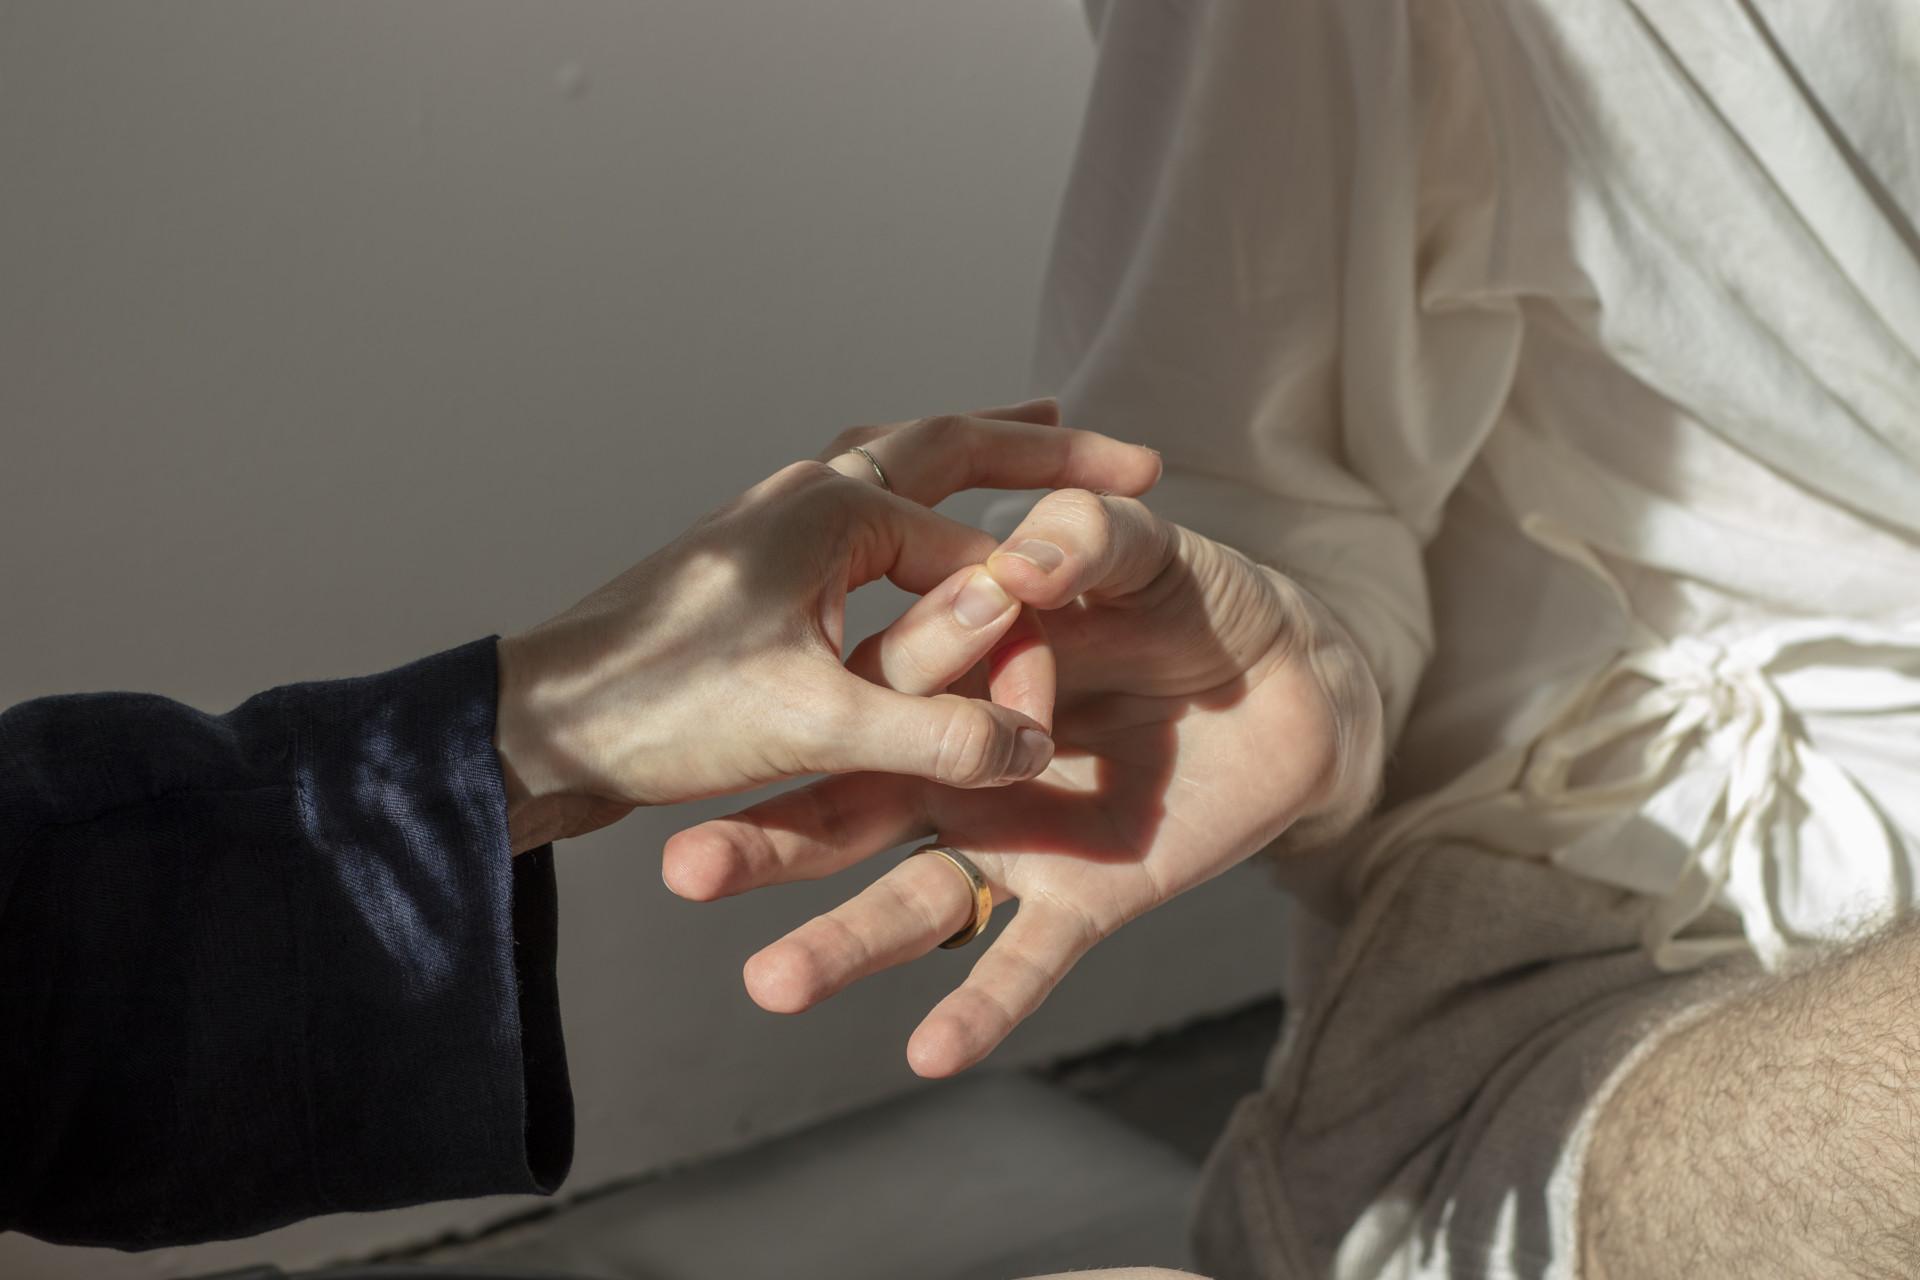 lukas hofmann / saliva A Rehearsal